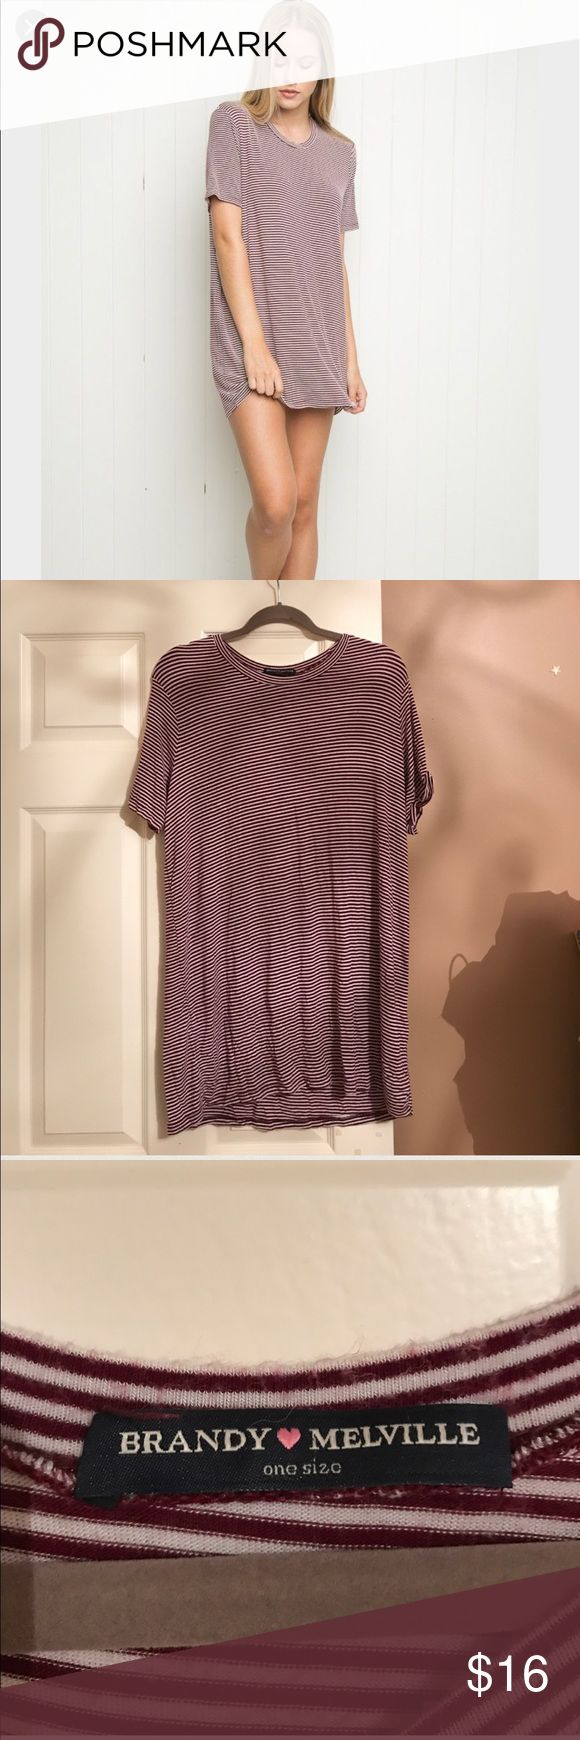 brandy melville stripped tshirt dress brandy melville stripped tshirt dress Brandy Melville Dresses